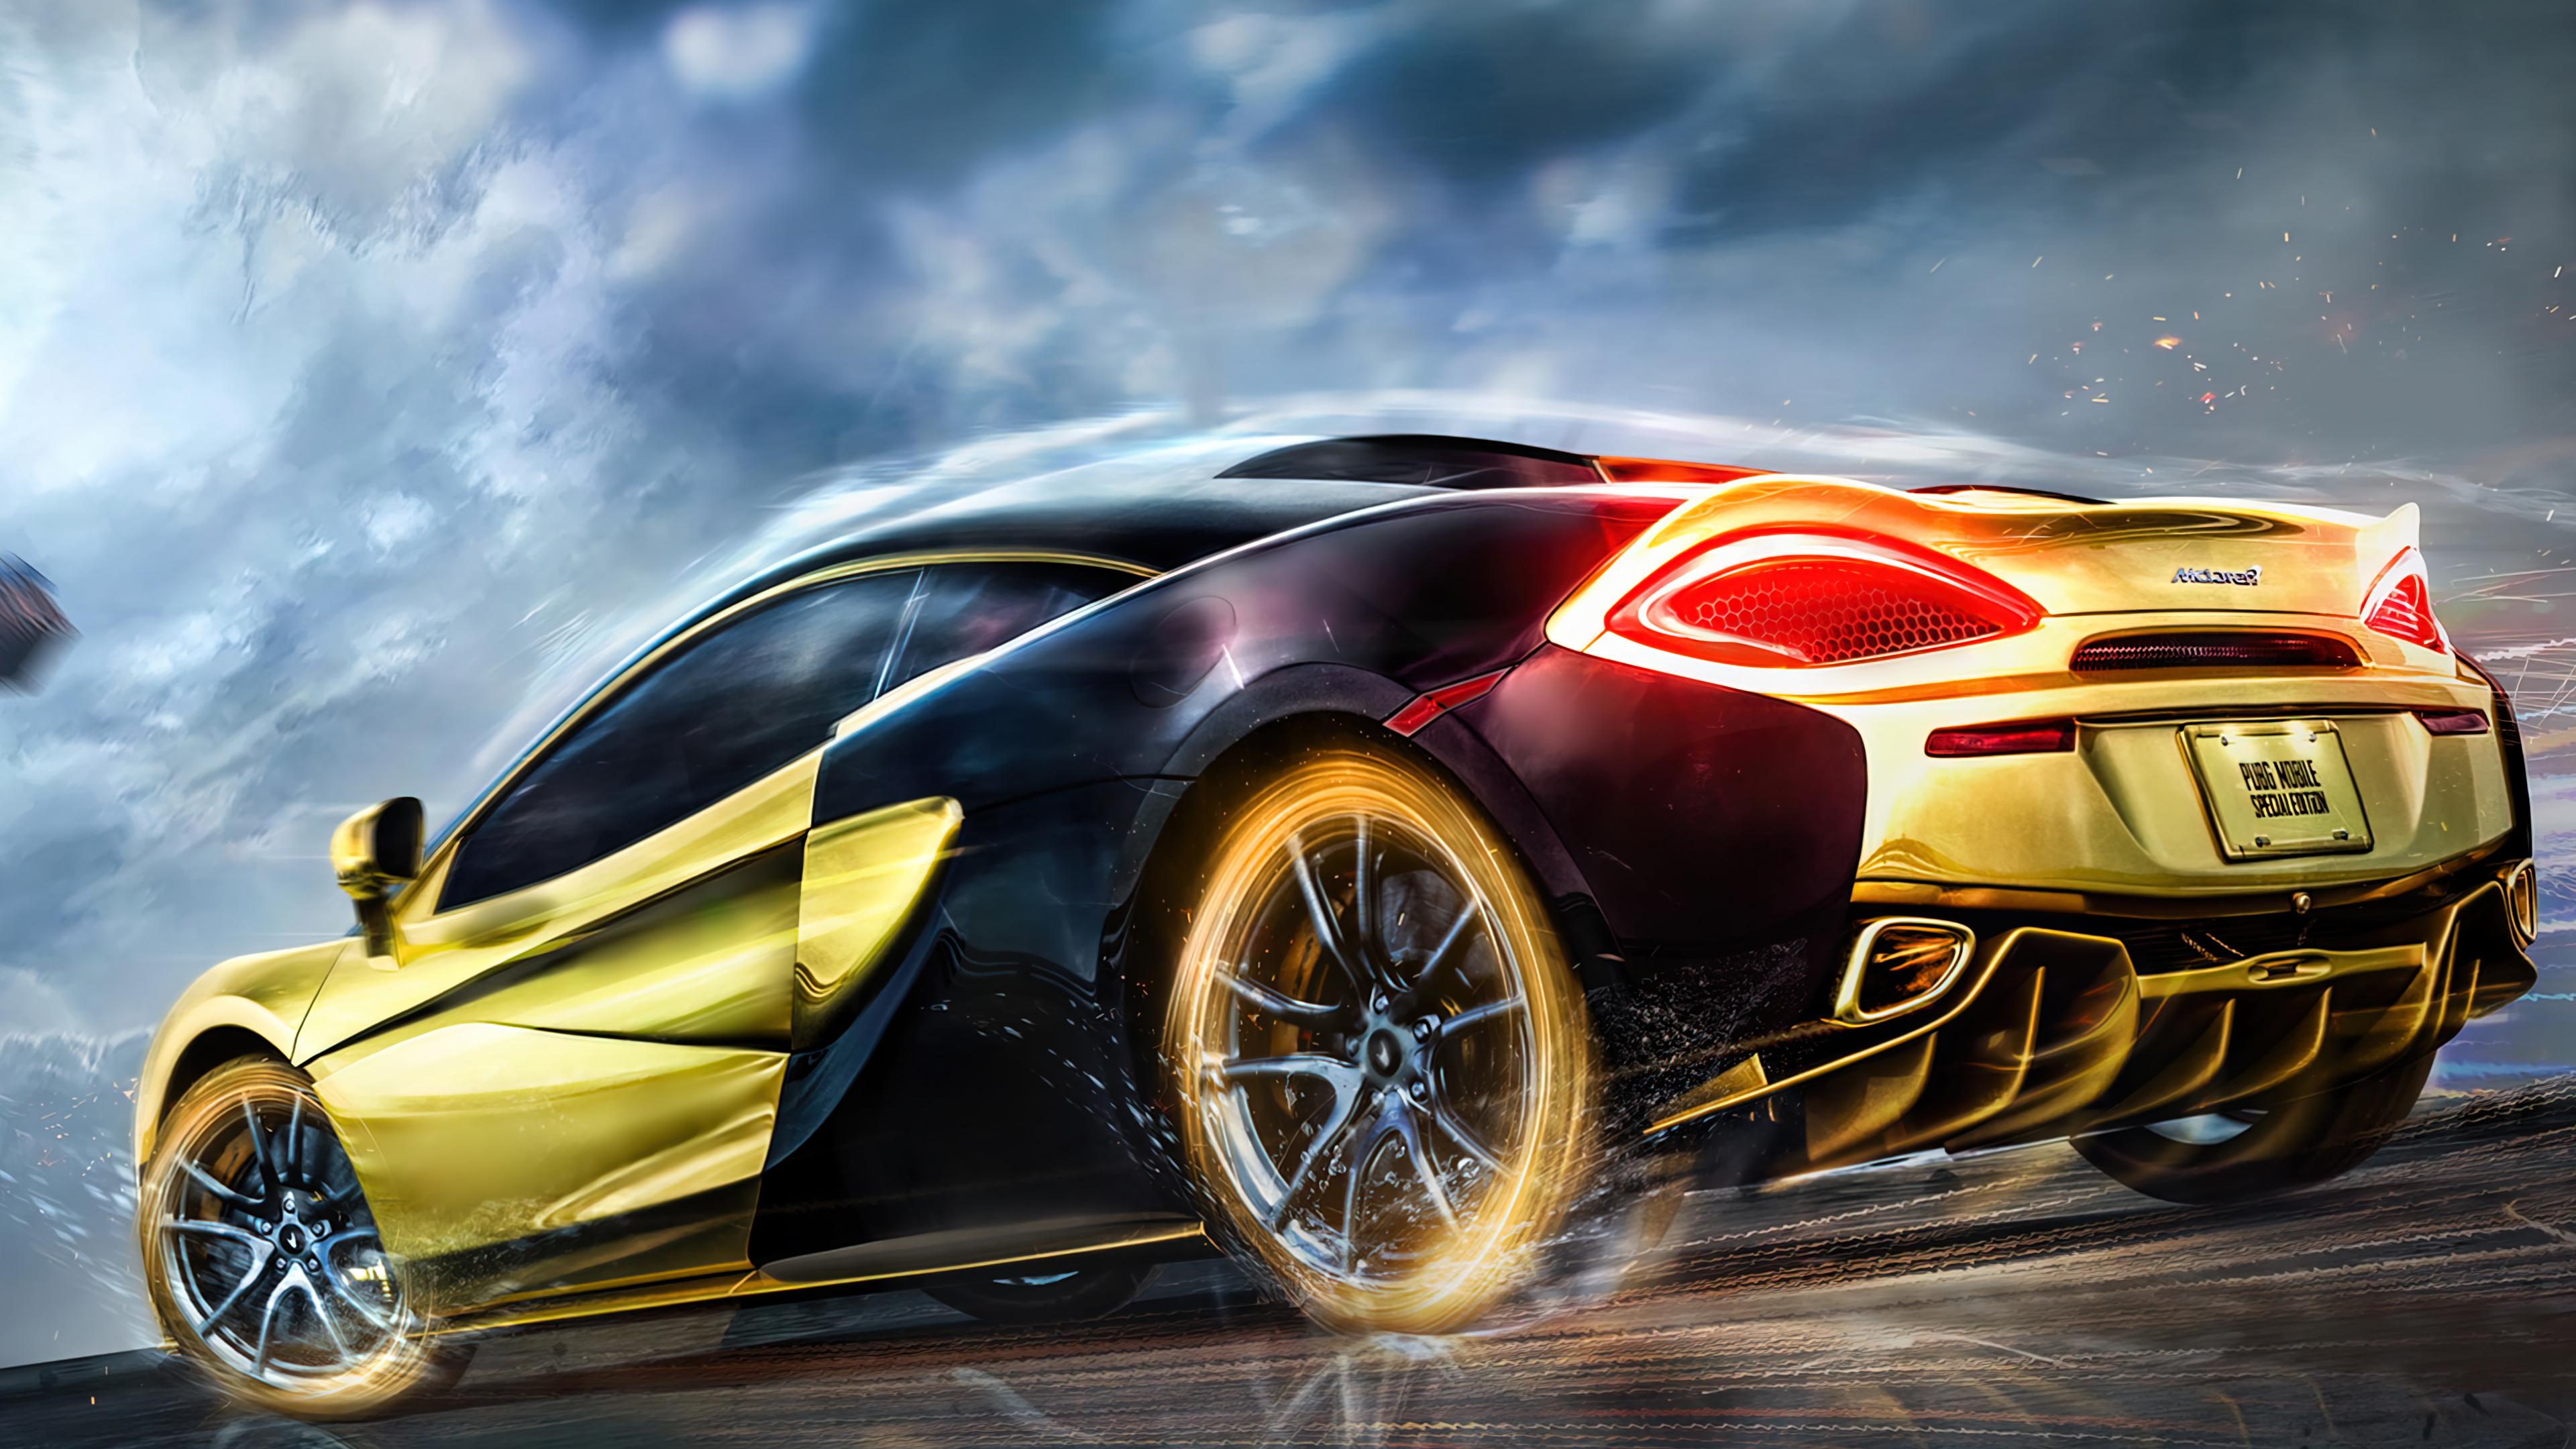 Lamborghini huracan sto edition front look 5k. Pubg Mobile Gold Mclaren Sports Car 4k Phone Iphone Wallpaper 7670a